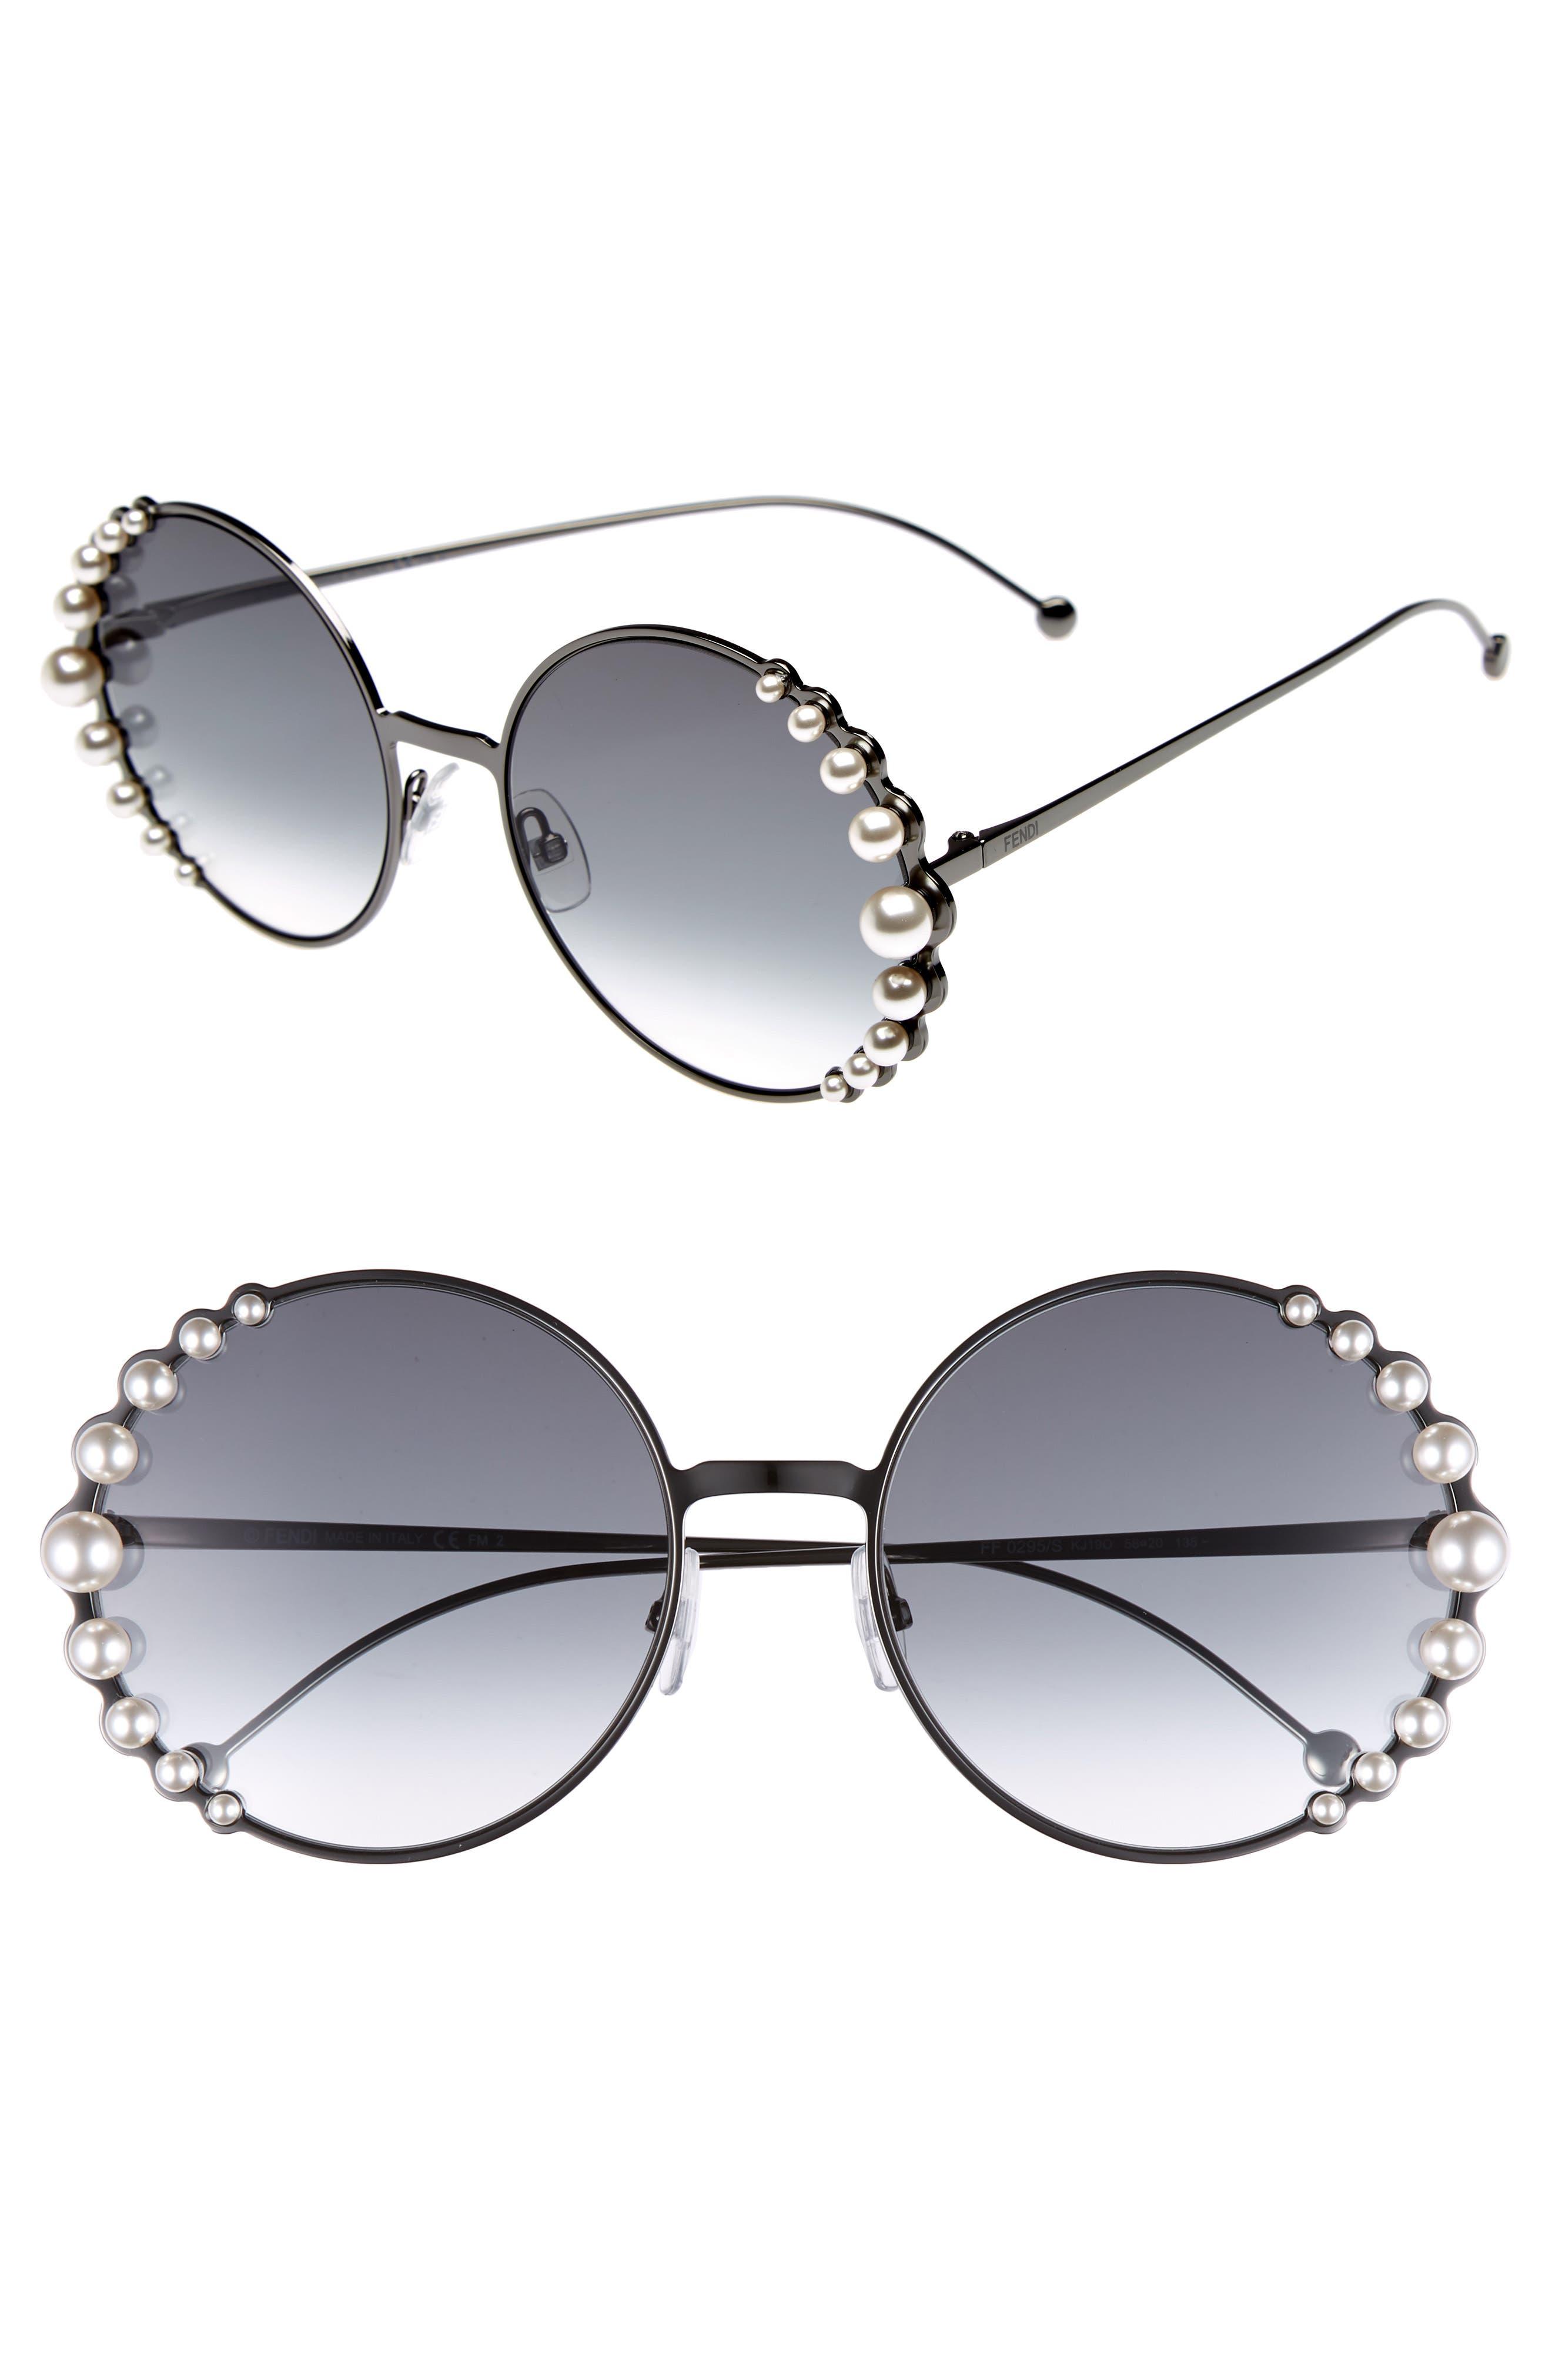 58mm Embellished Round Sunglasses,                             Main thumbnail 1, color,                             Dark Ruthenium